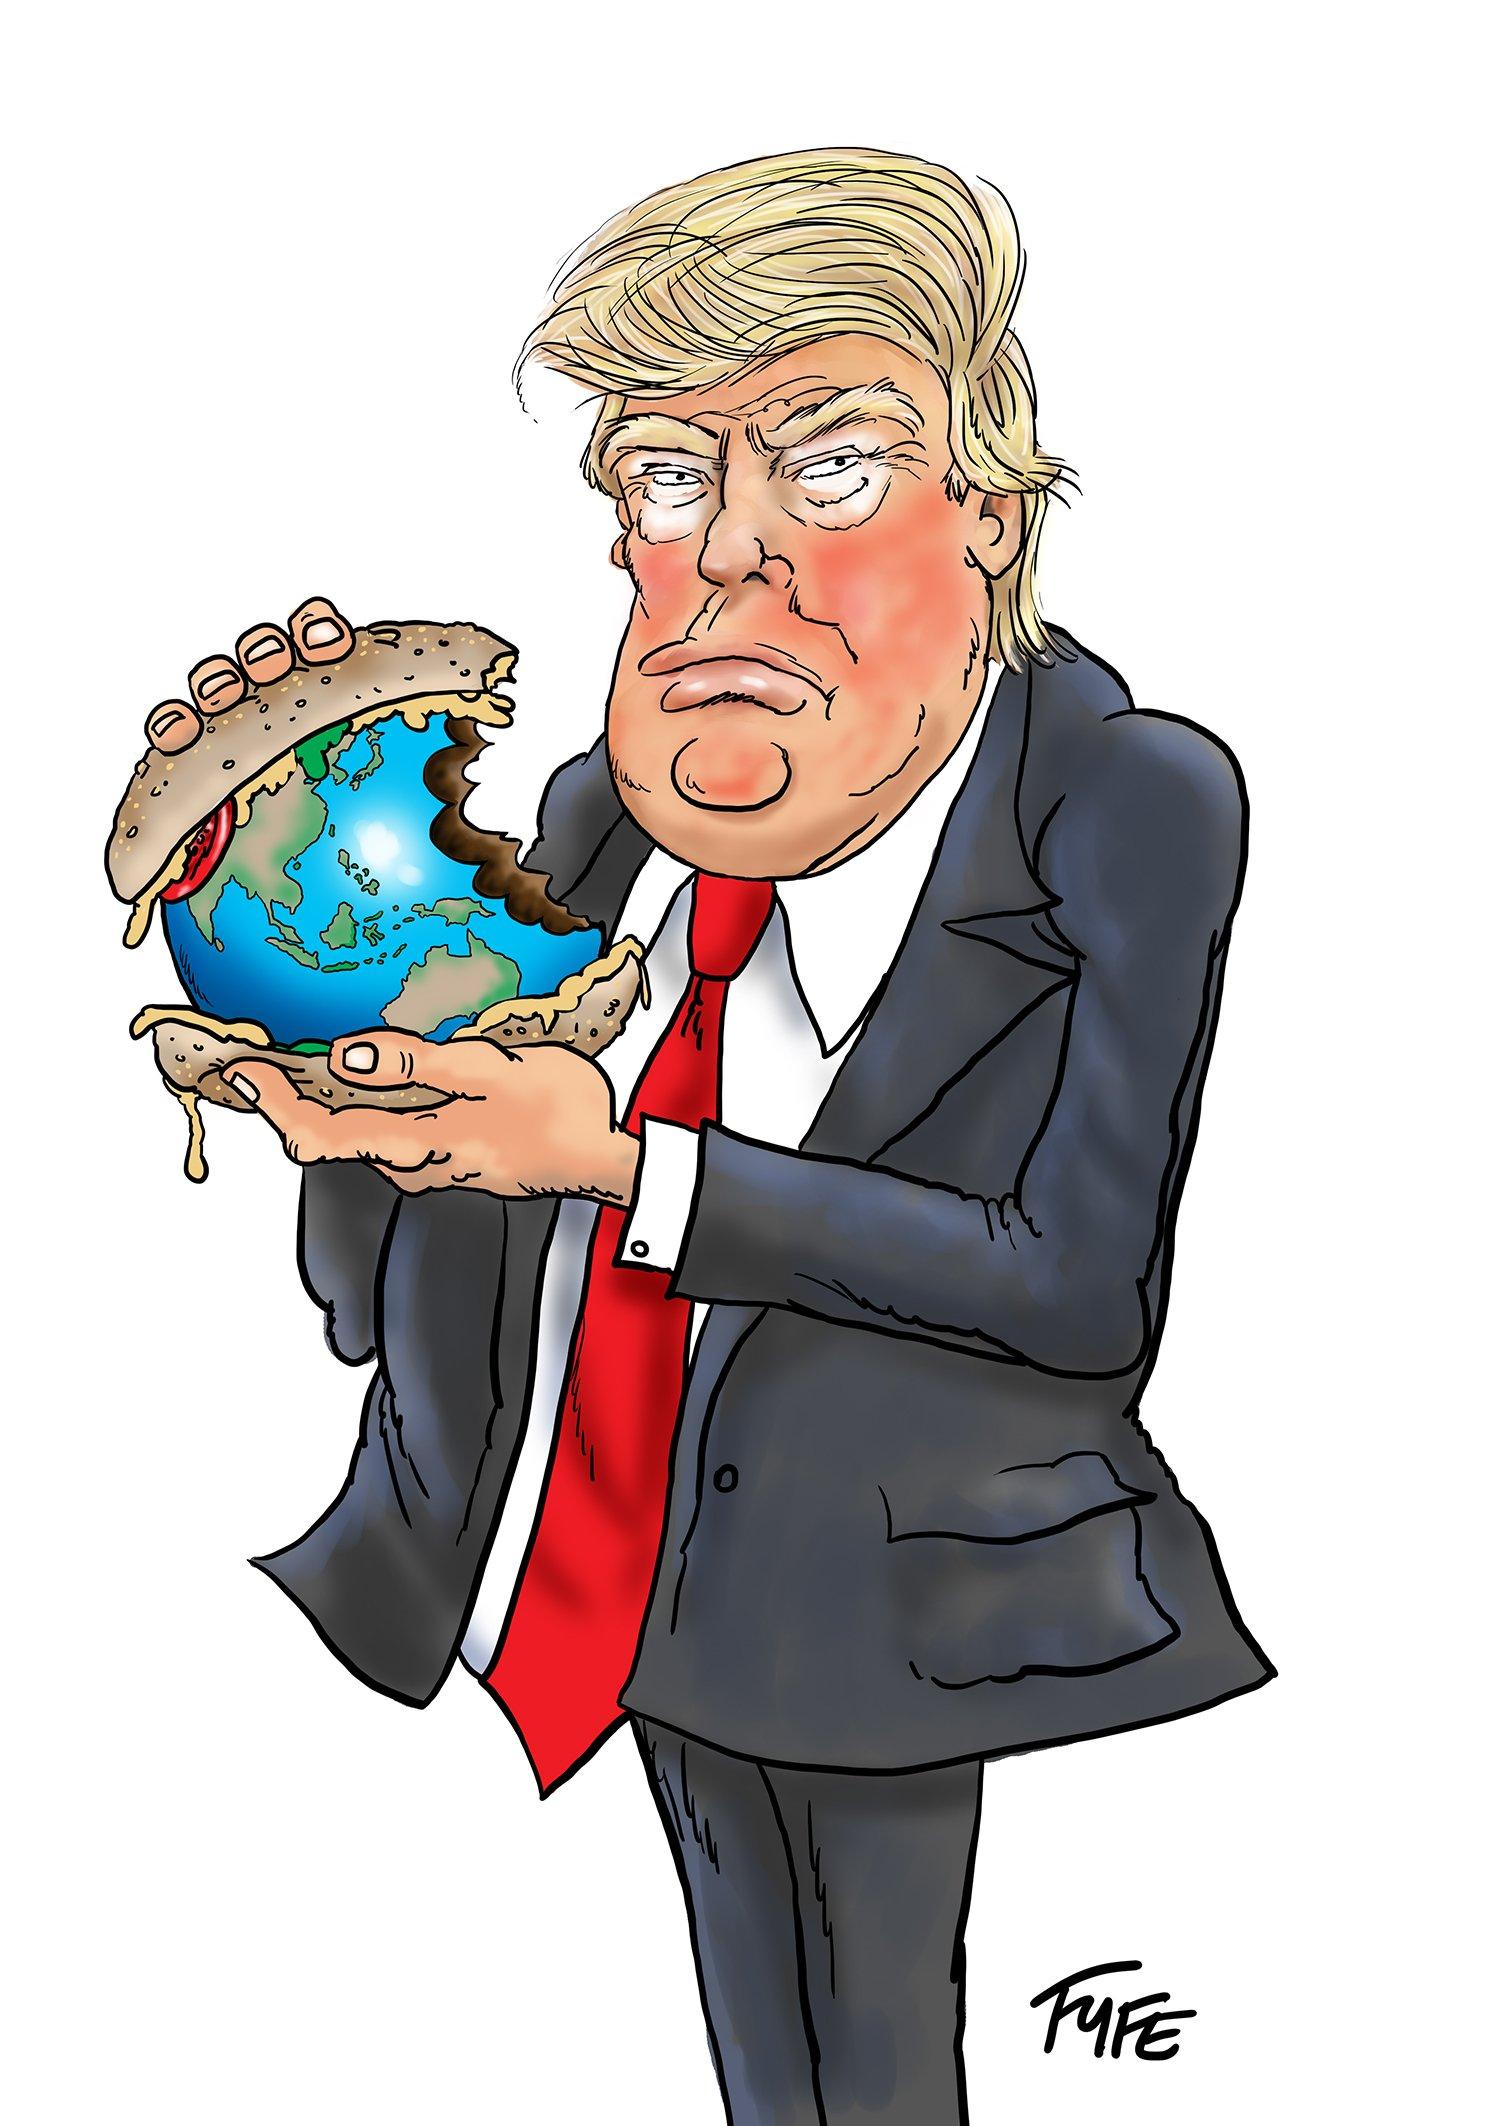 Donald Trump caricature, Trump caricature, Donald Trump cartoon, Trump cartoon